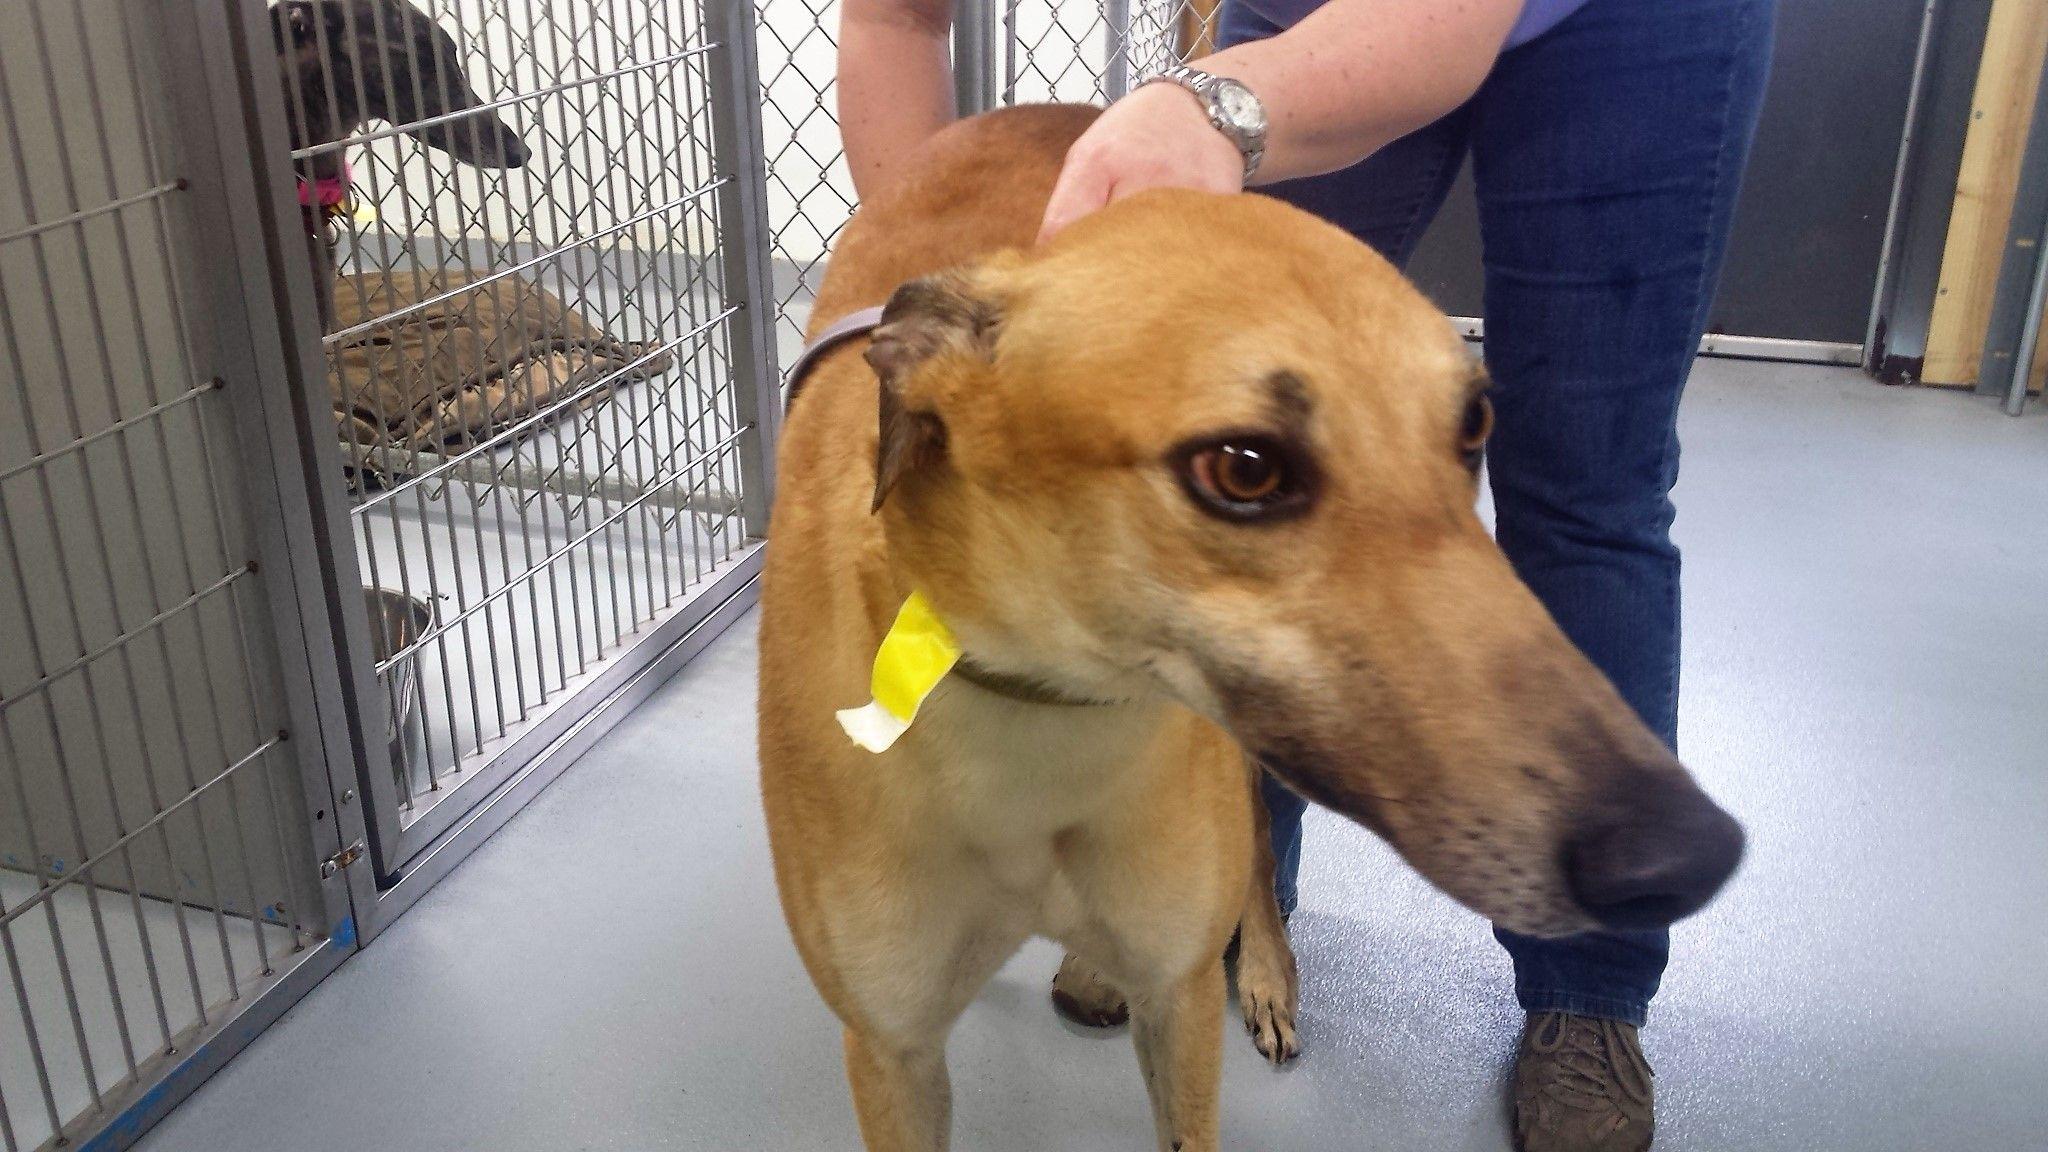 Greyhound dog for Adoption in Kansas City, MO. ADN541295